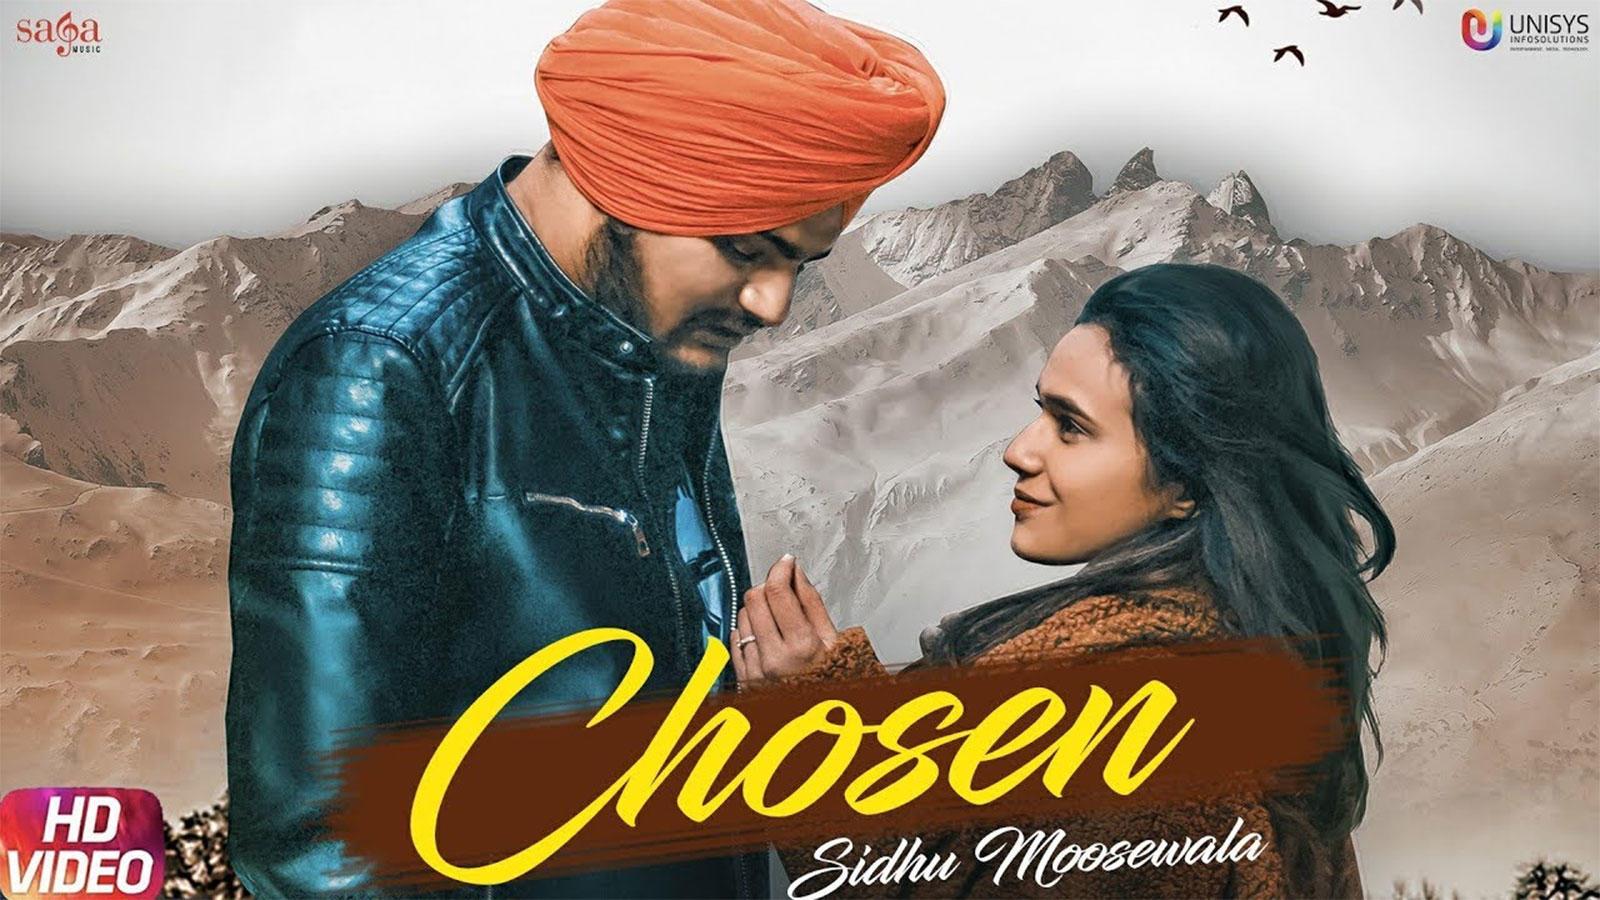 Latest Punjabi Song Chosen Sung By Sidhu Moosewala Ft  Sunny Malton